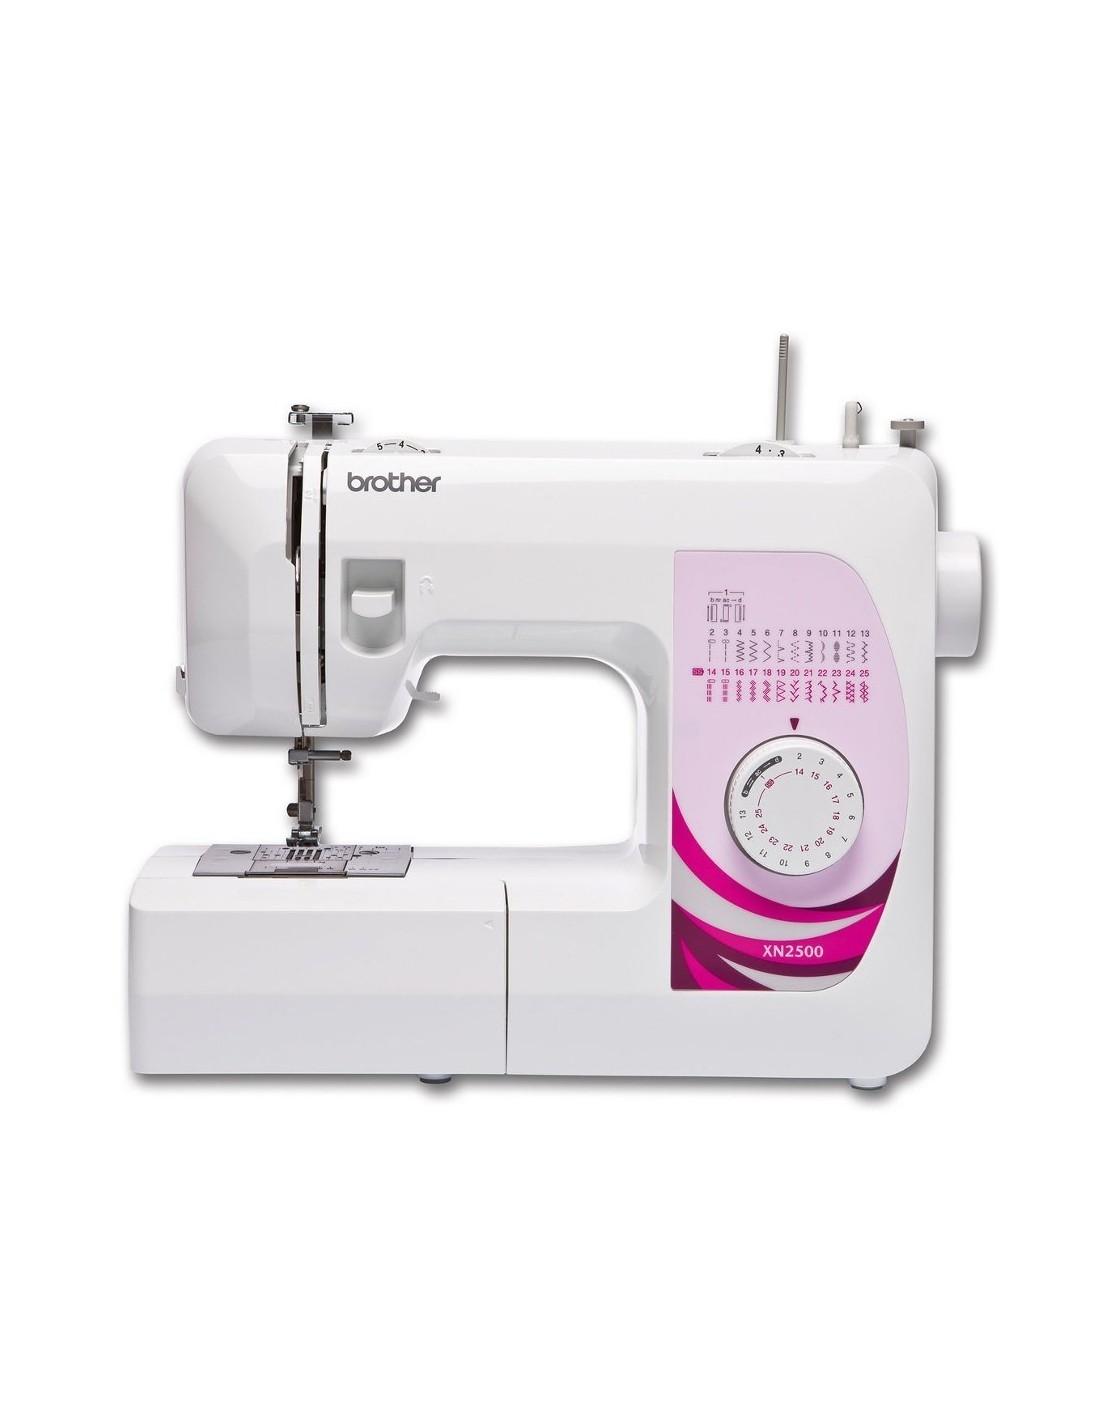 macchina per cucire brother xn2500 macchine per cucire